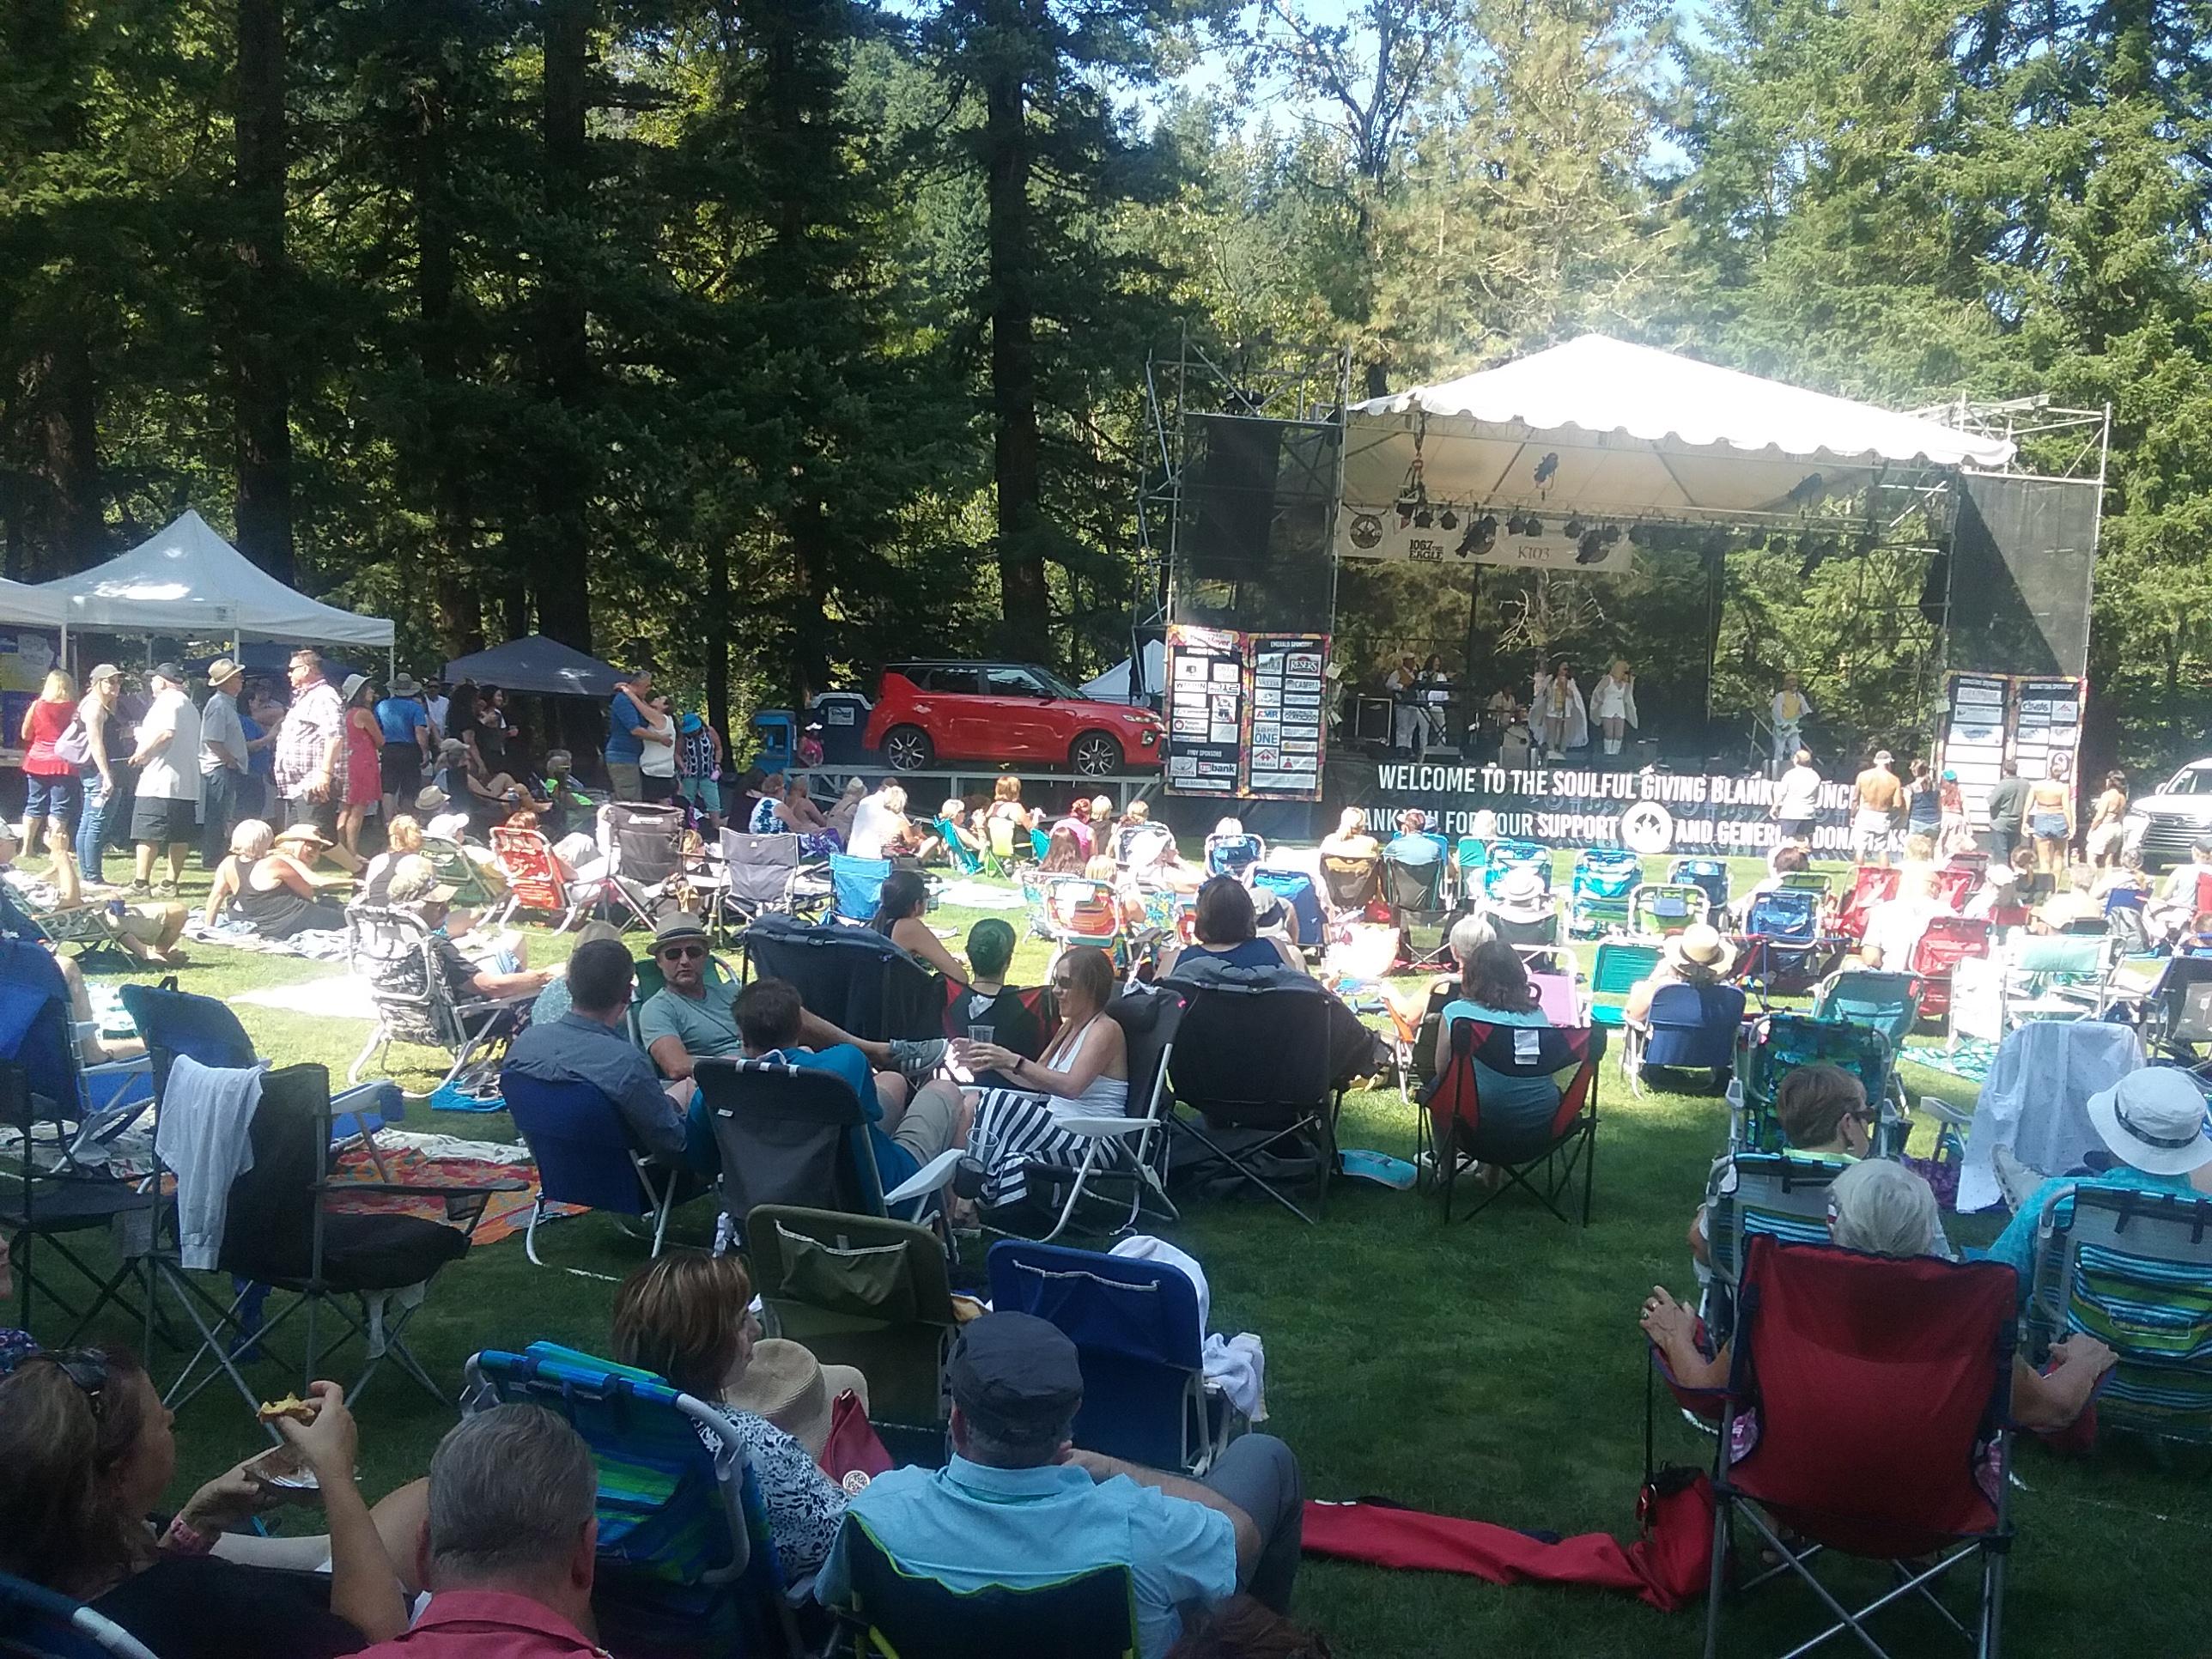 Weston Summer Concert